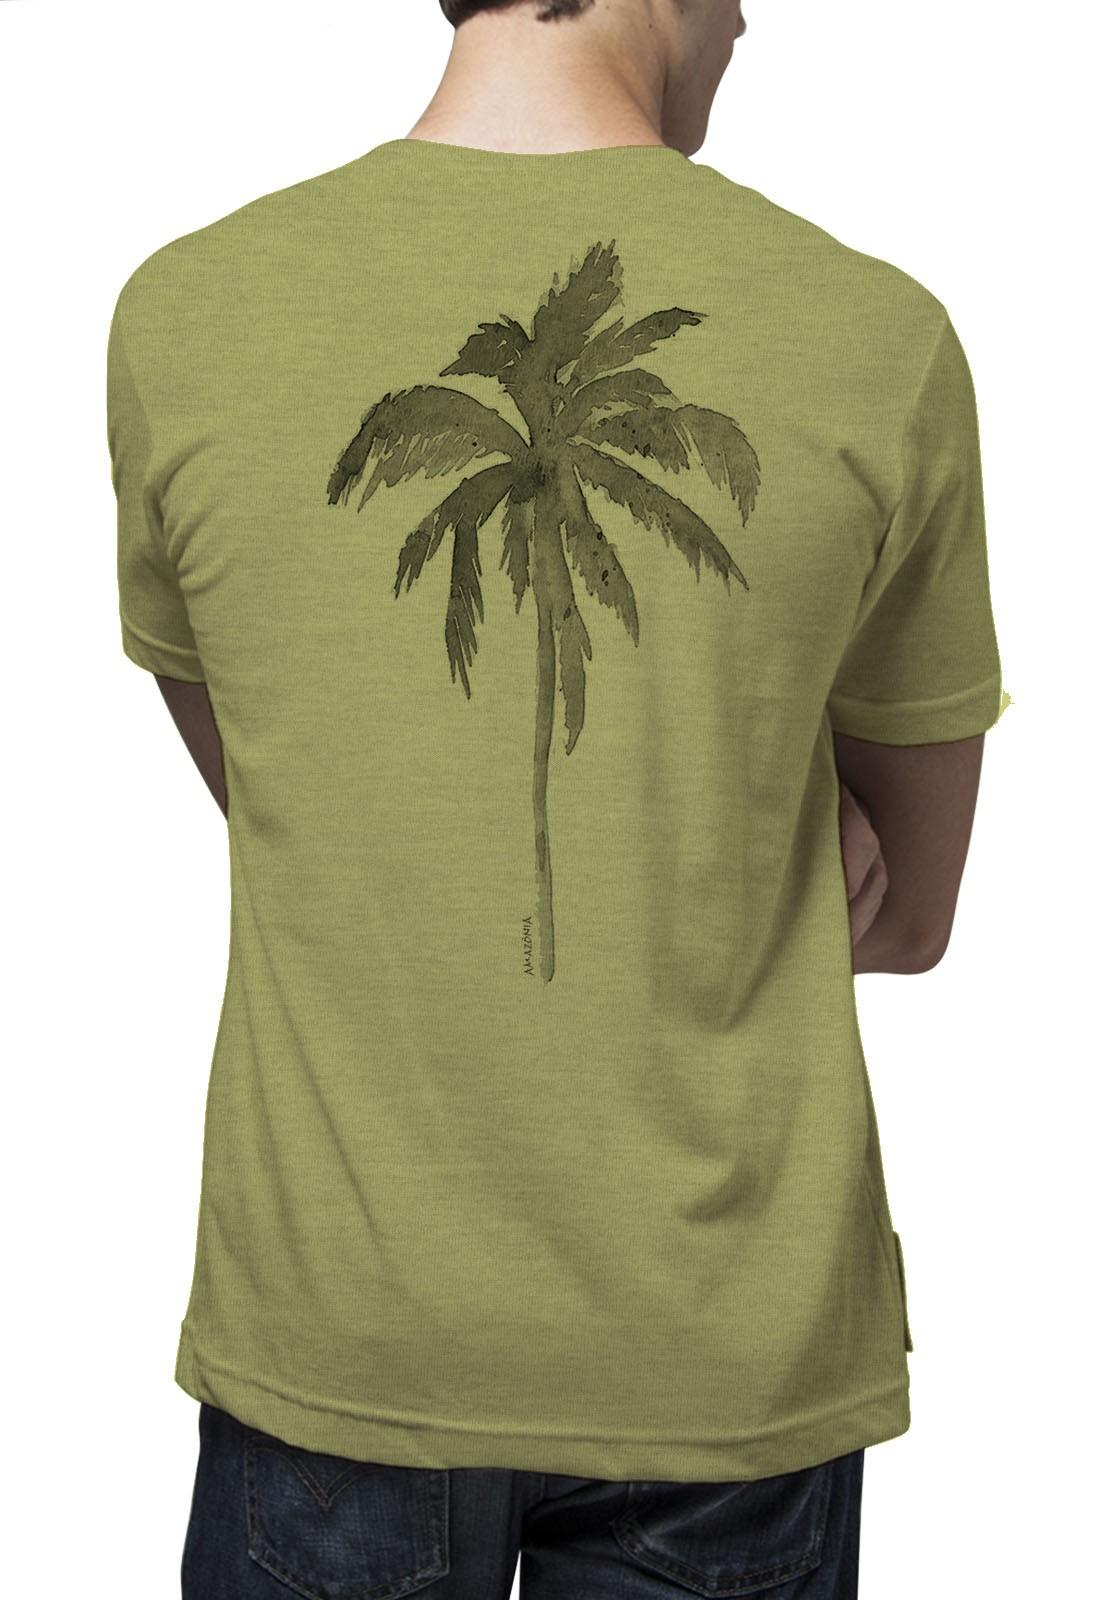 Camiseta Amazônia Tropical - Mescla Amarelo